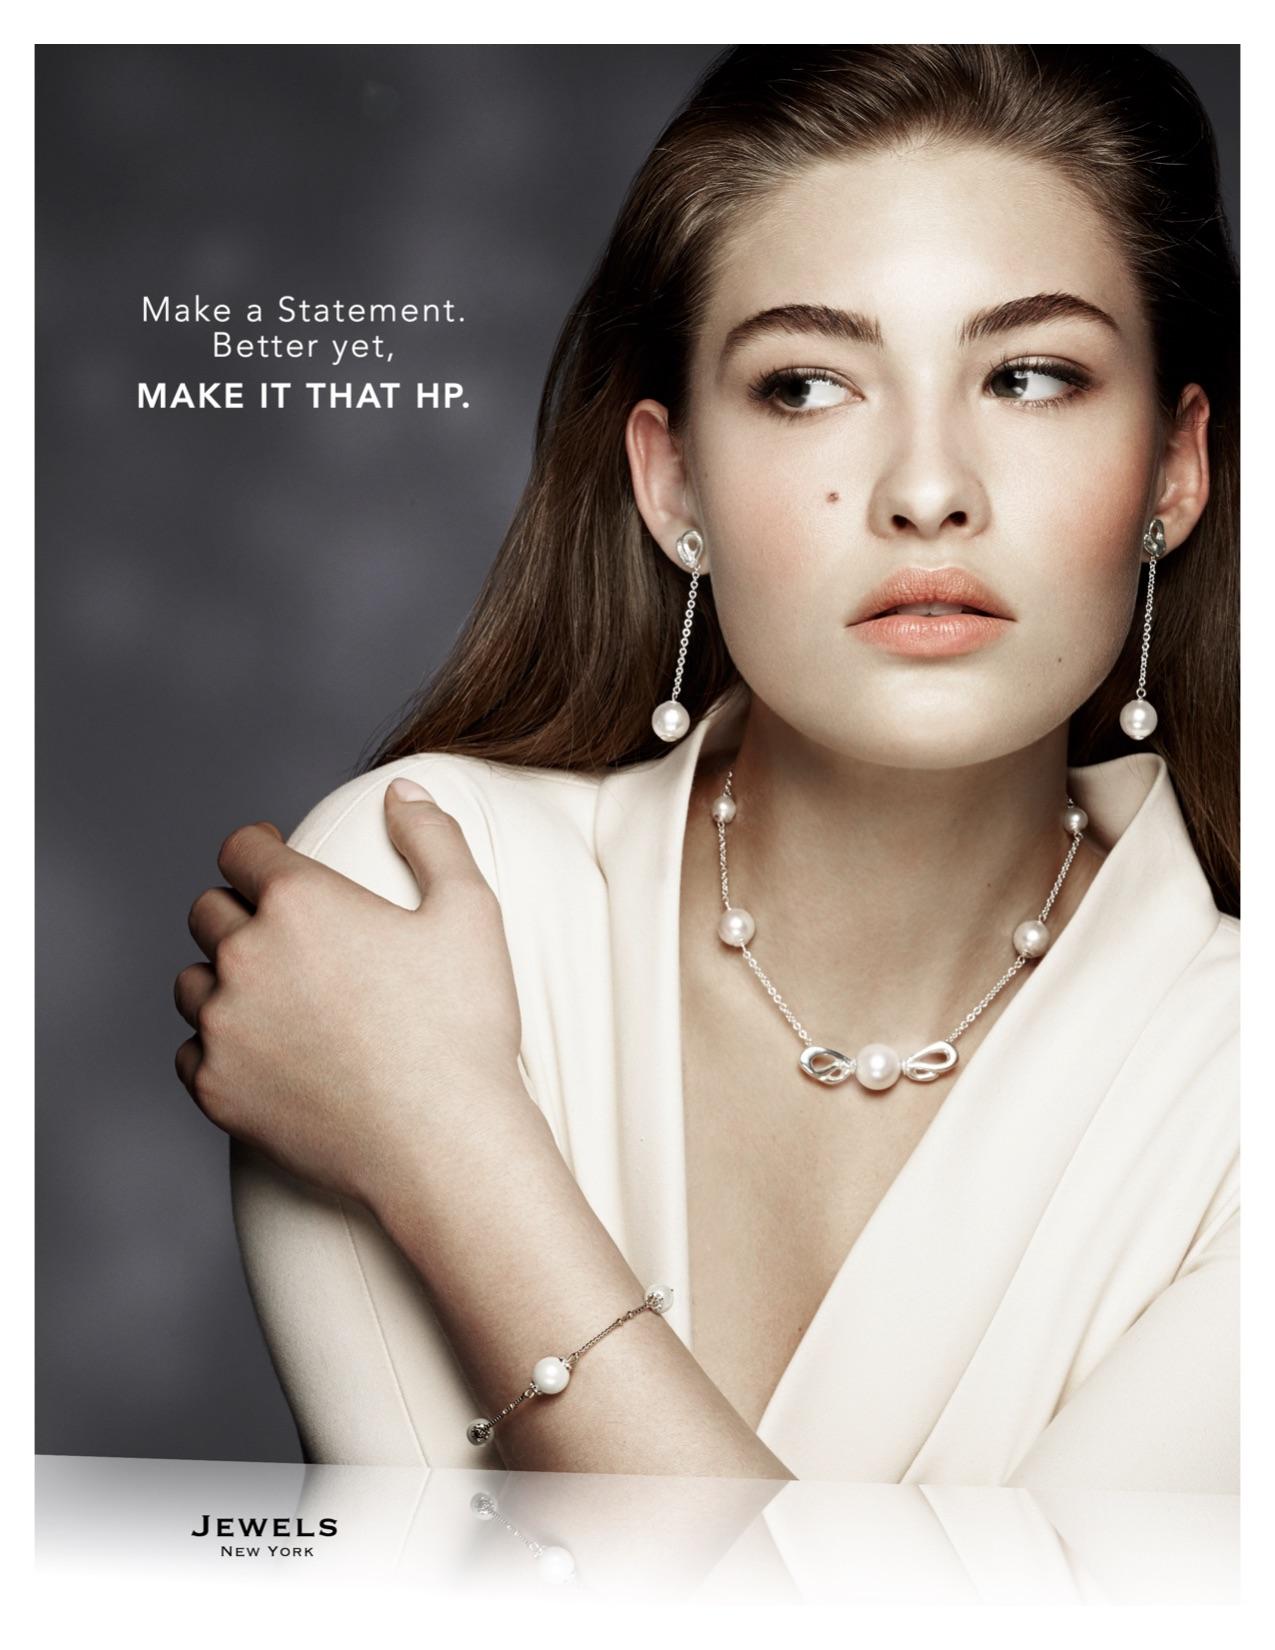 Faux_LAYOUT_jewelry_V.jpg